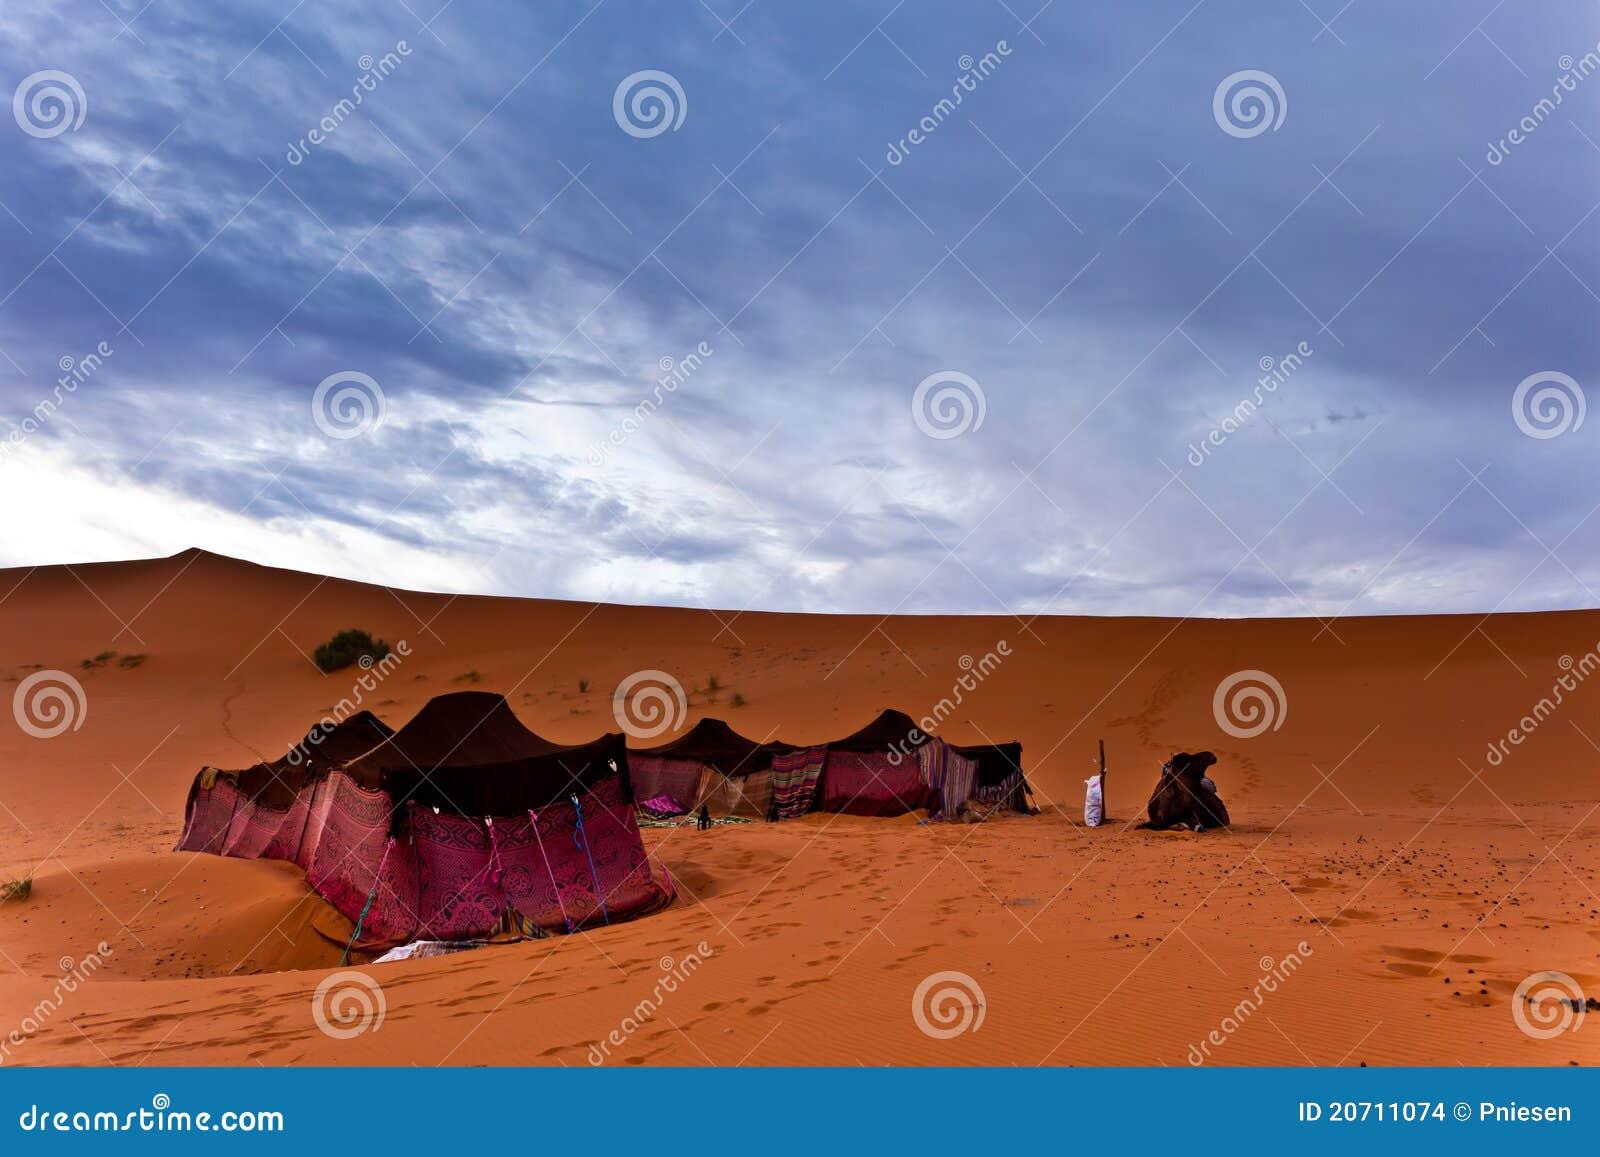 Bedouin Tents In The Sahara Desert Stock Photo - Image of . & Beduin Tents - Ecosia